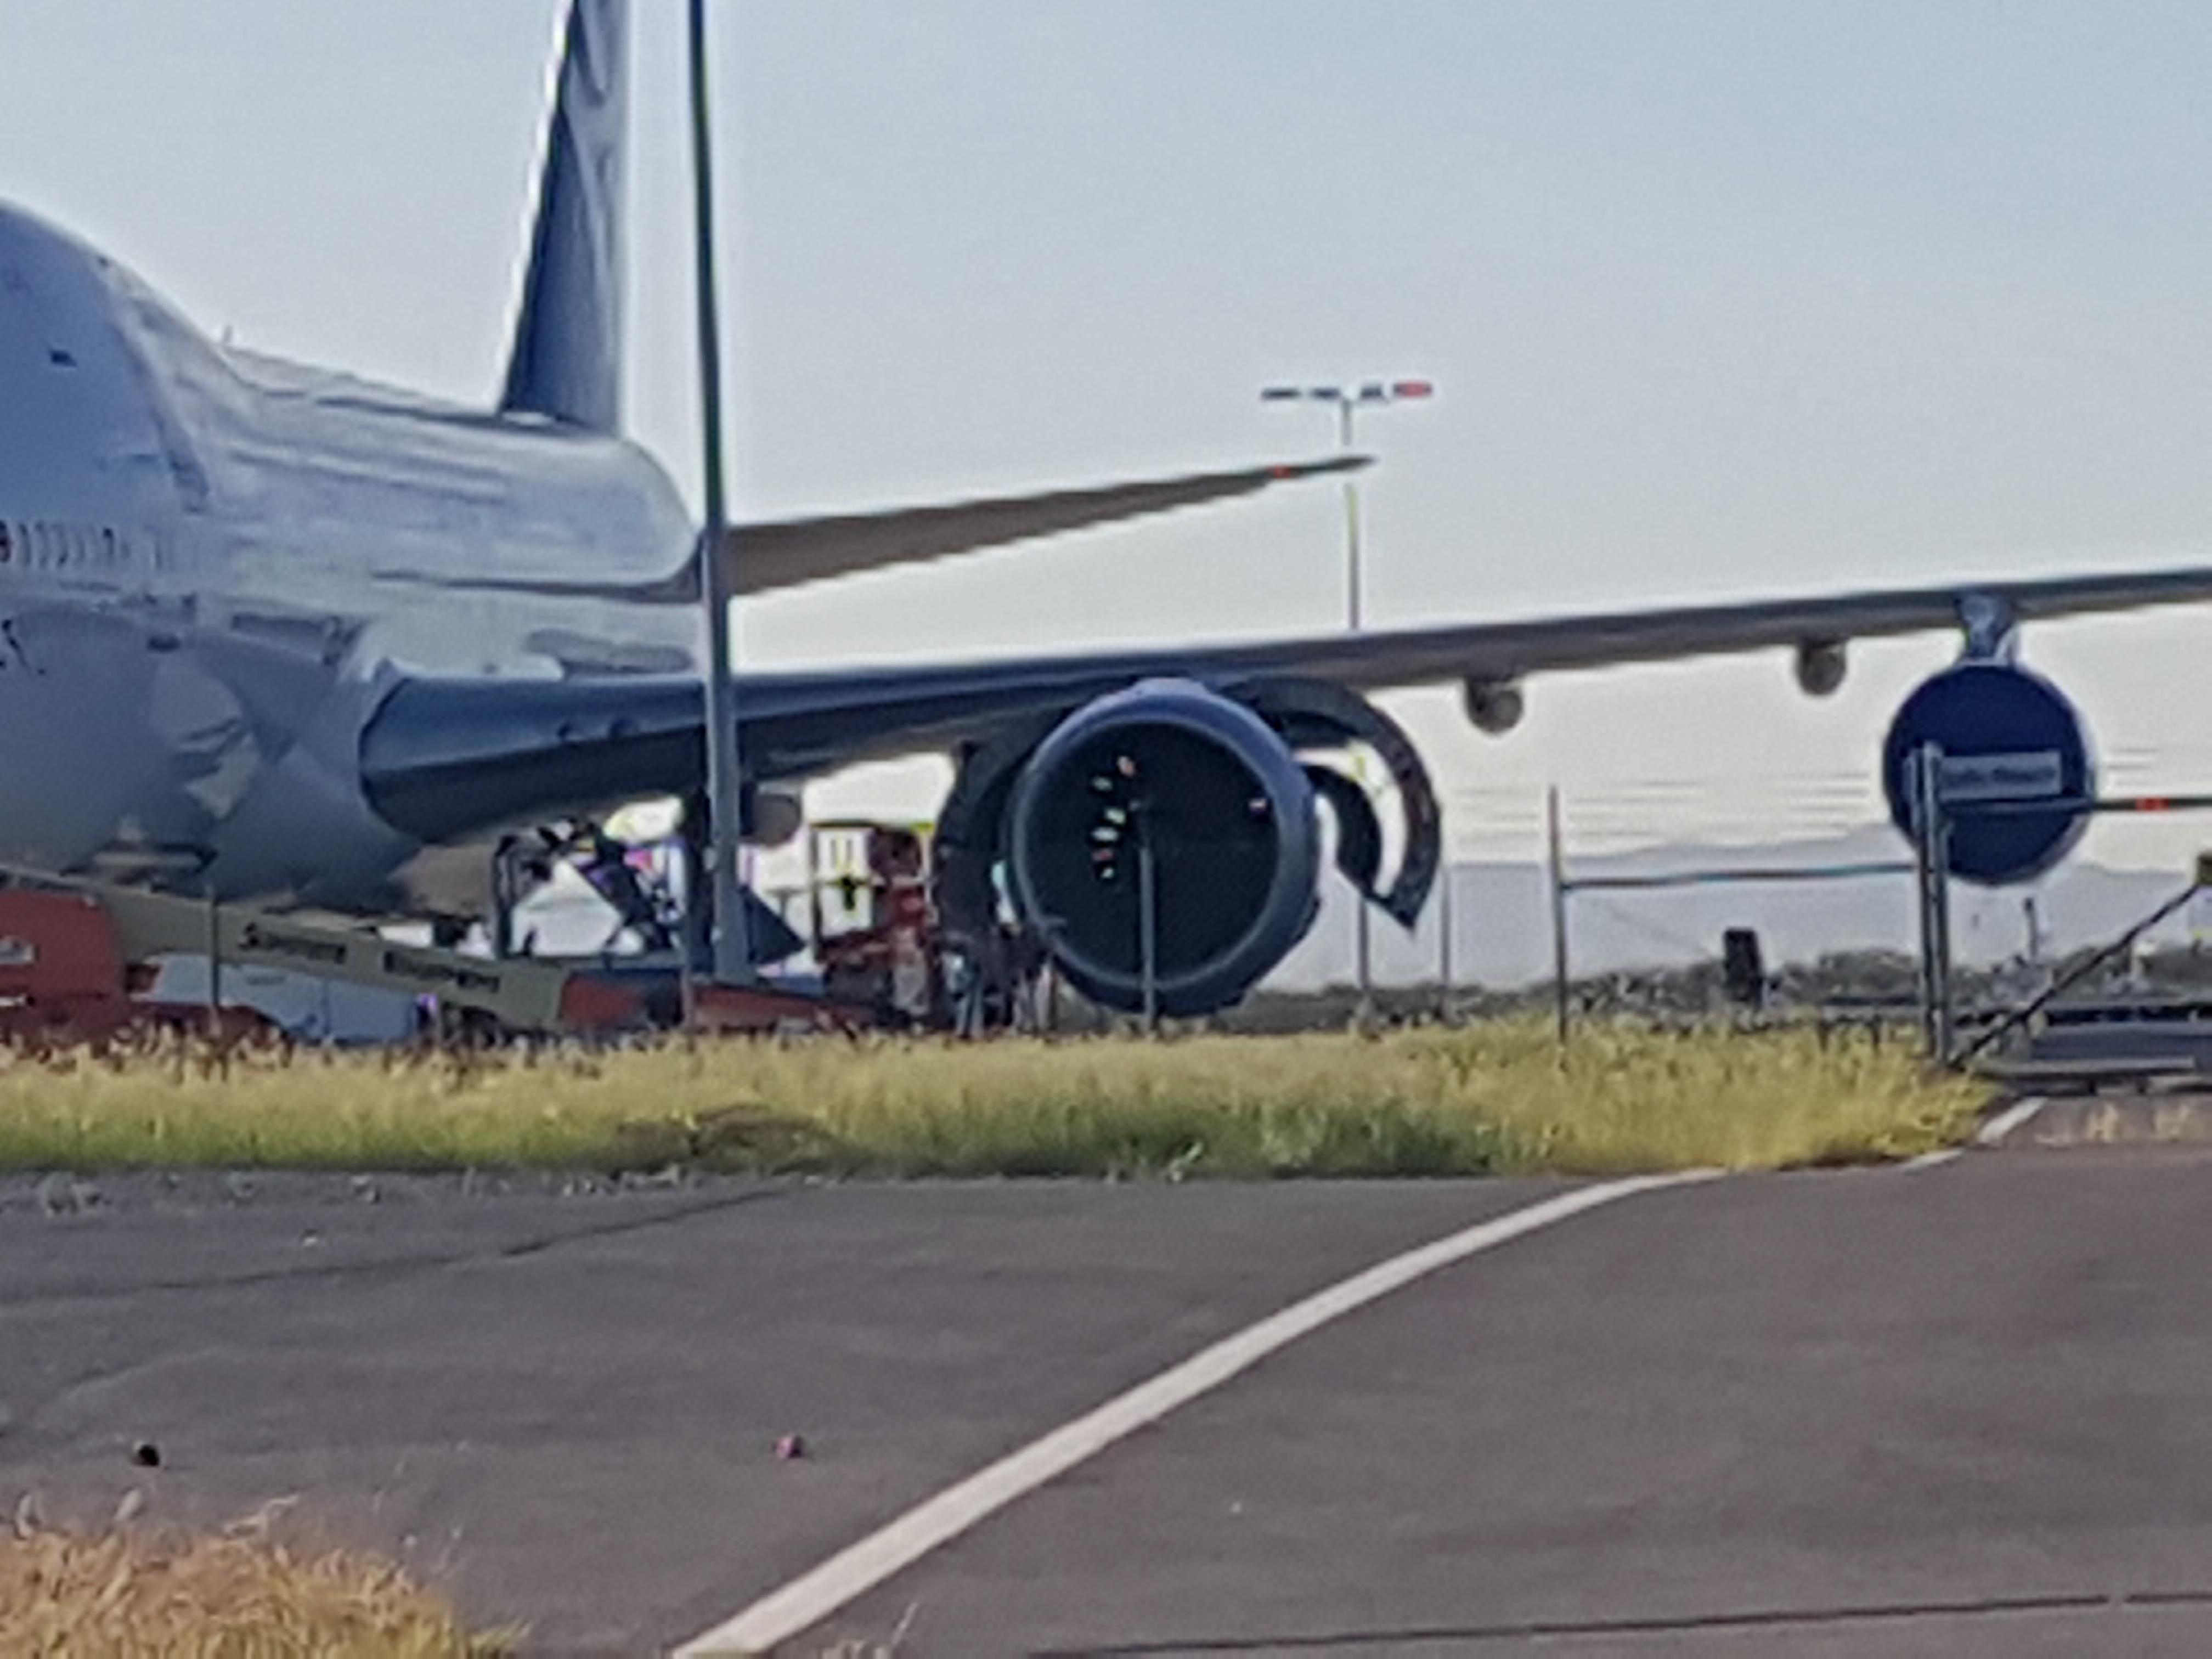 IntelligentEngine and Aviation Engine Access Stand